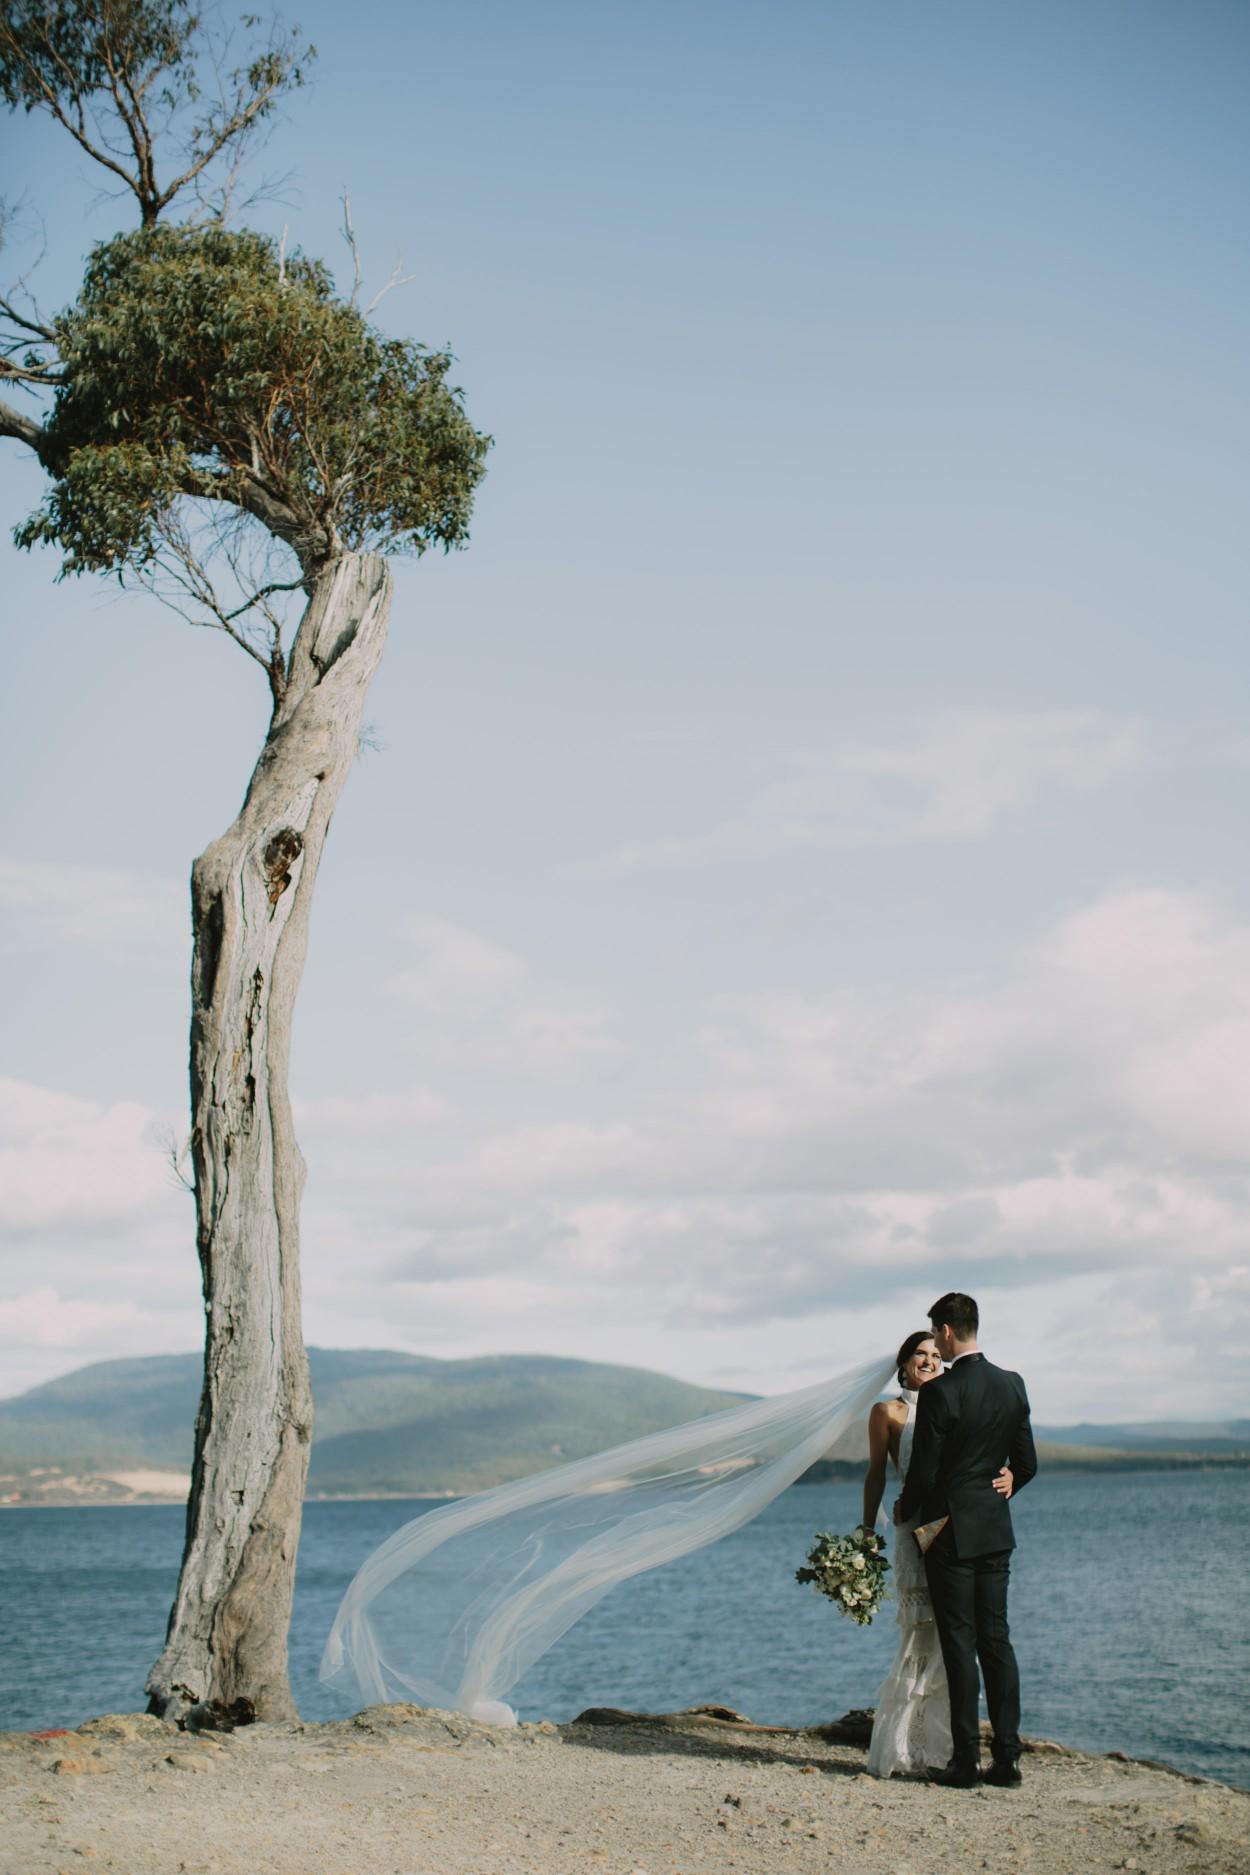 I-Got-You-Babe-&-Co.-Wedding-Photographers-Cassie001.jpg